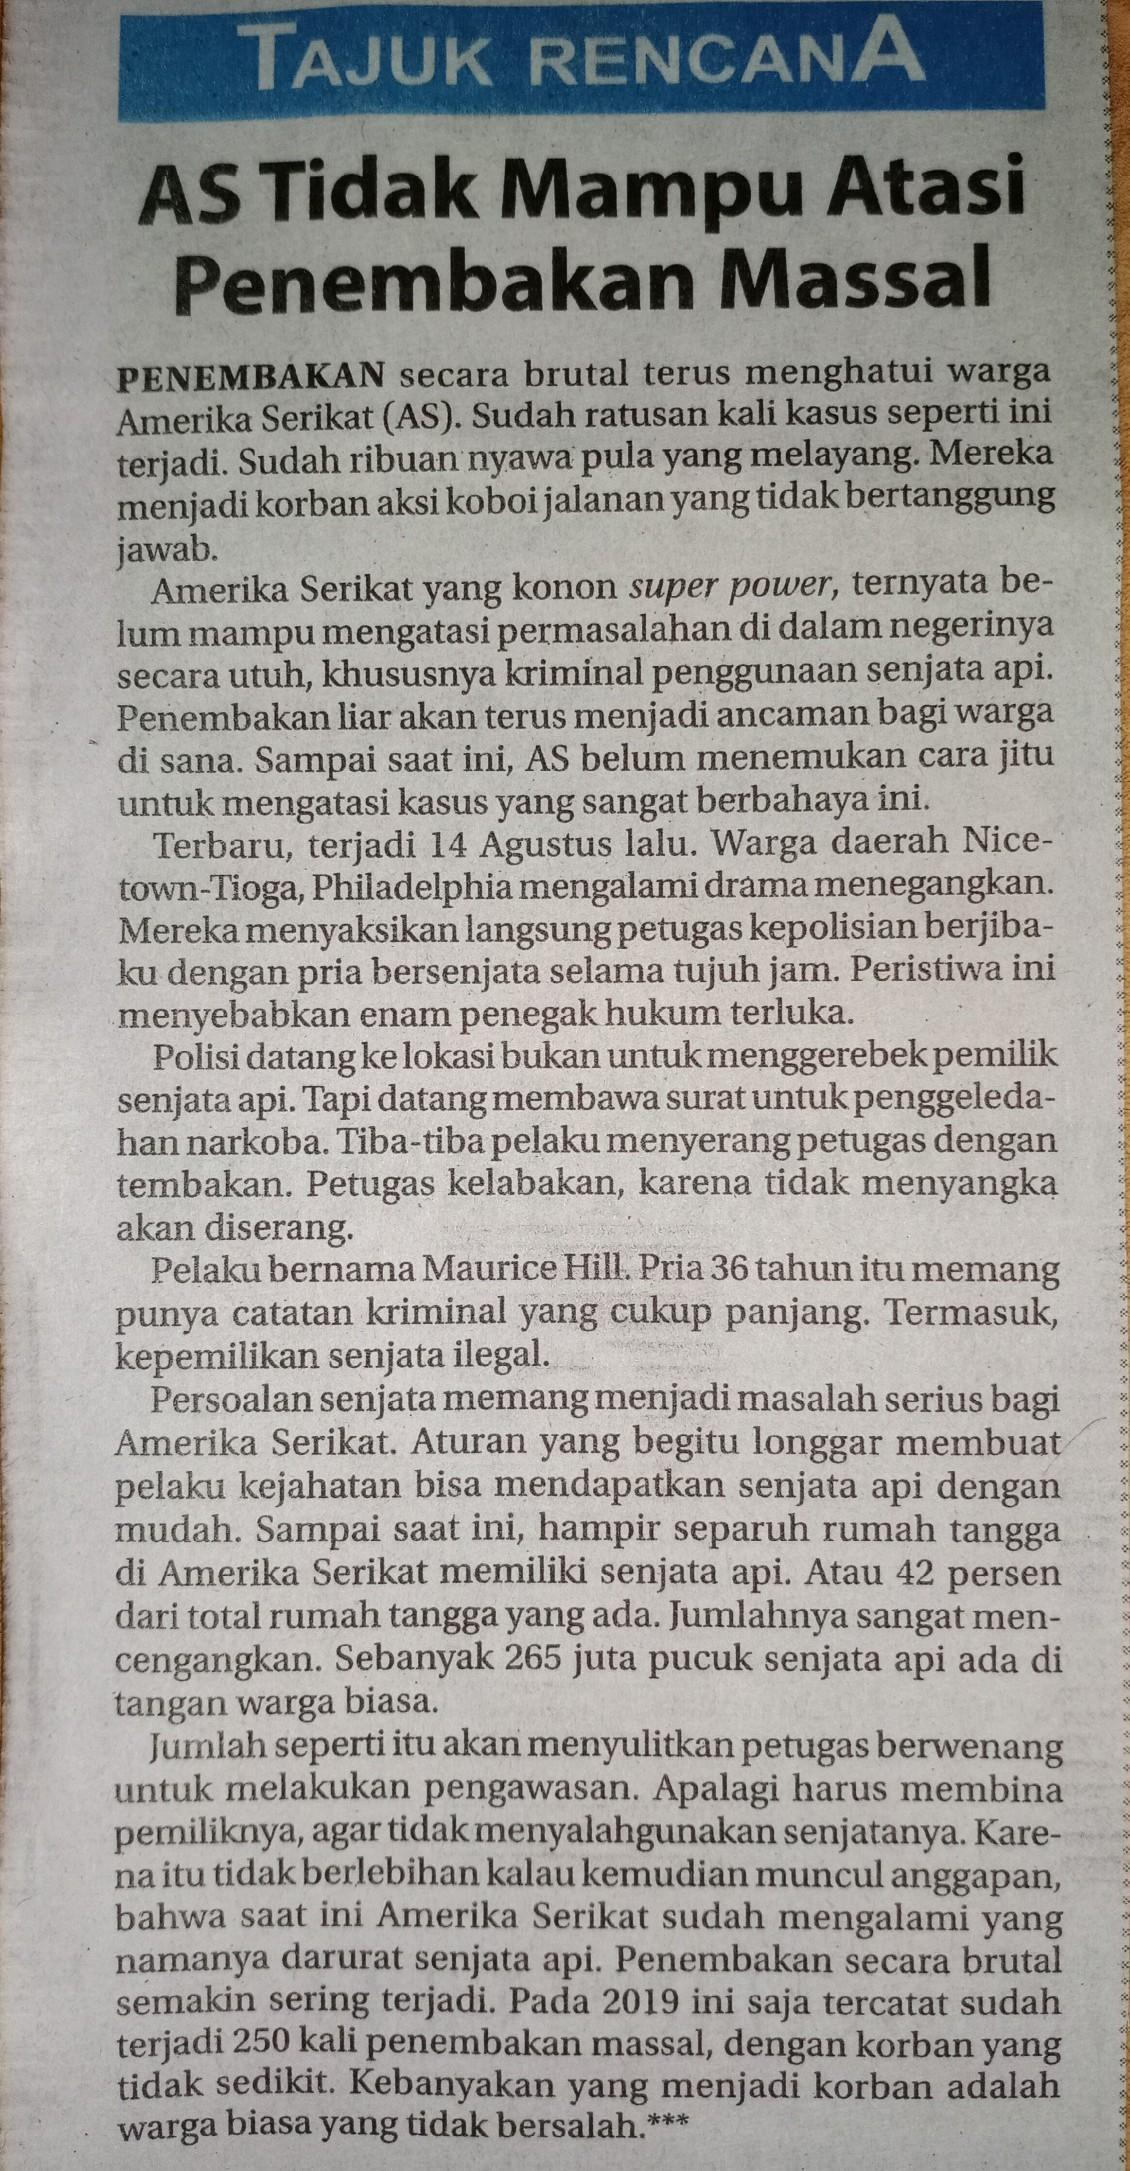 Teks Editorial Adalah : editorial, adalah, Tentukan, Masalah, Dalam, Editorial, Tersebut!, Aspek, Pendekatan, Brainly.co.id